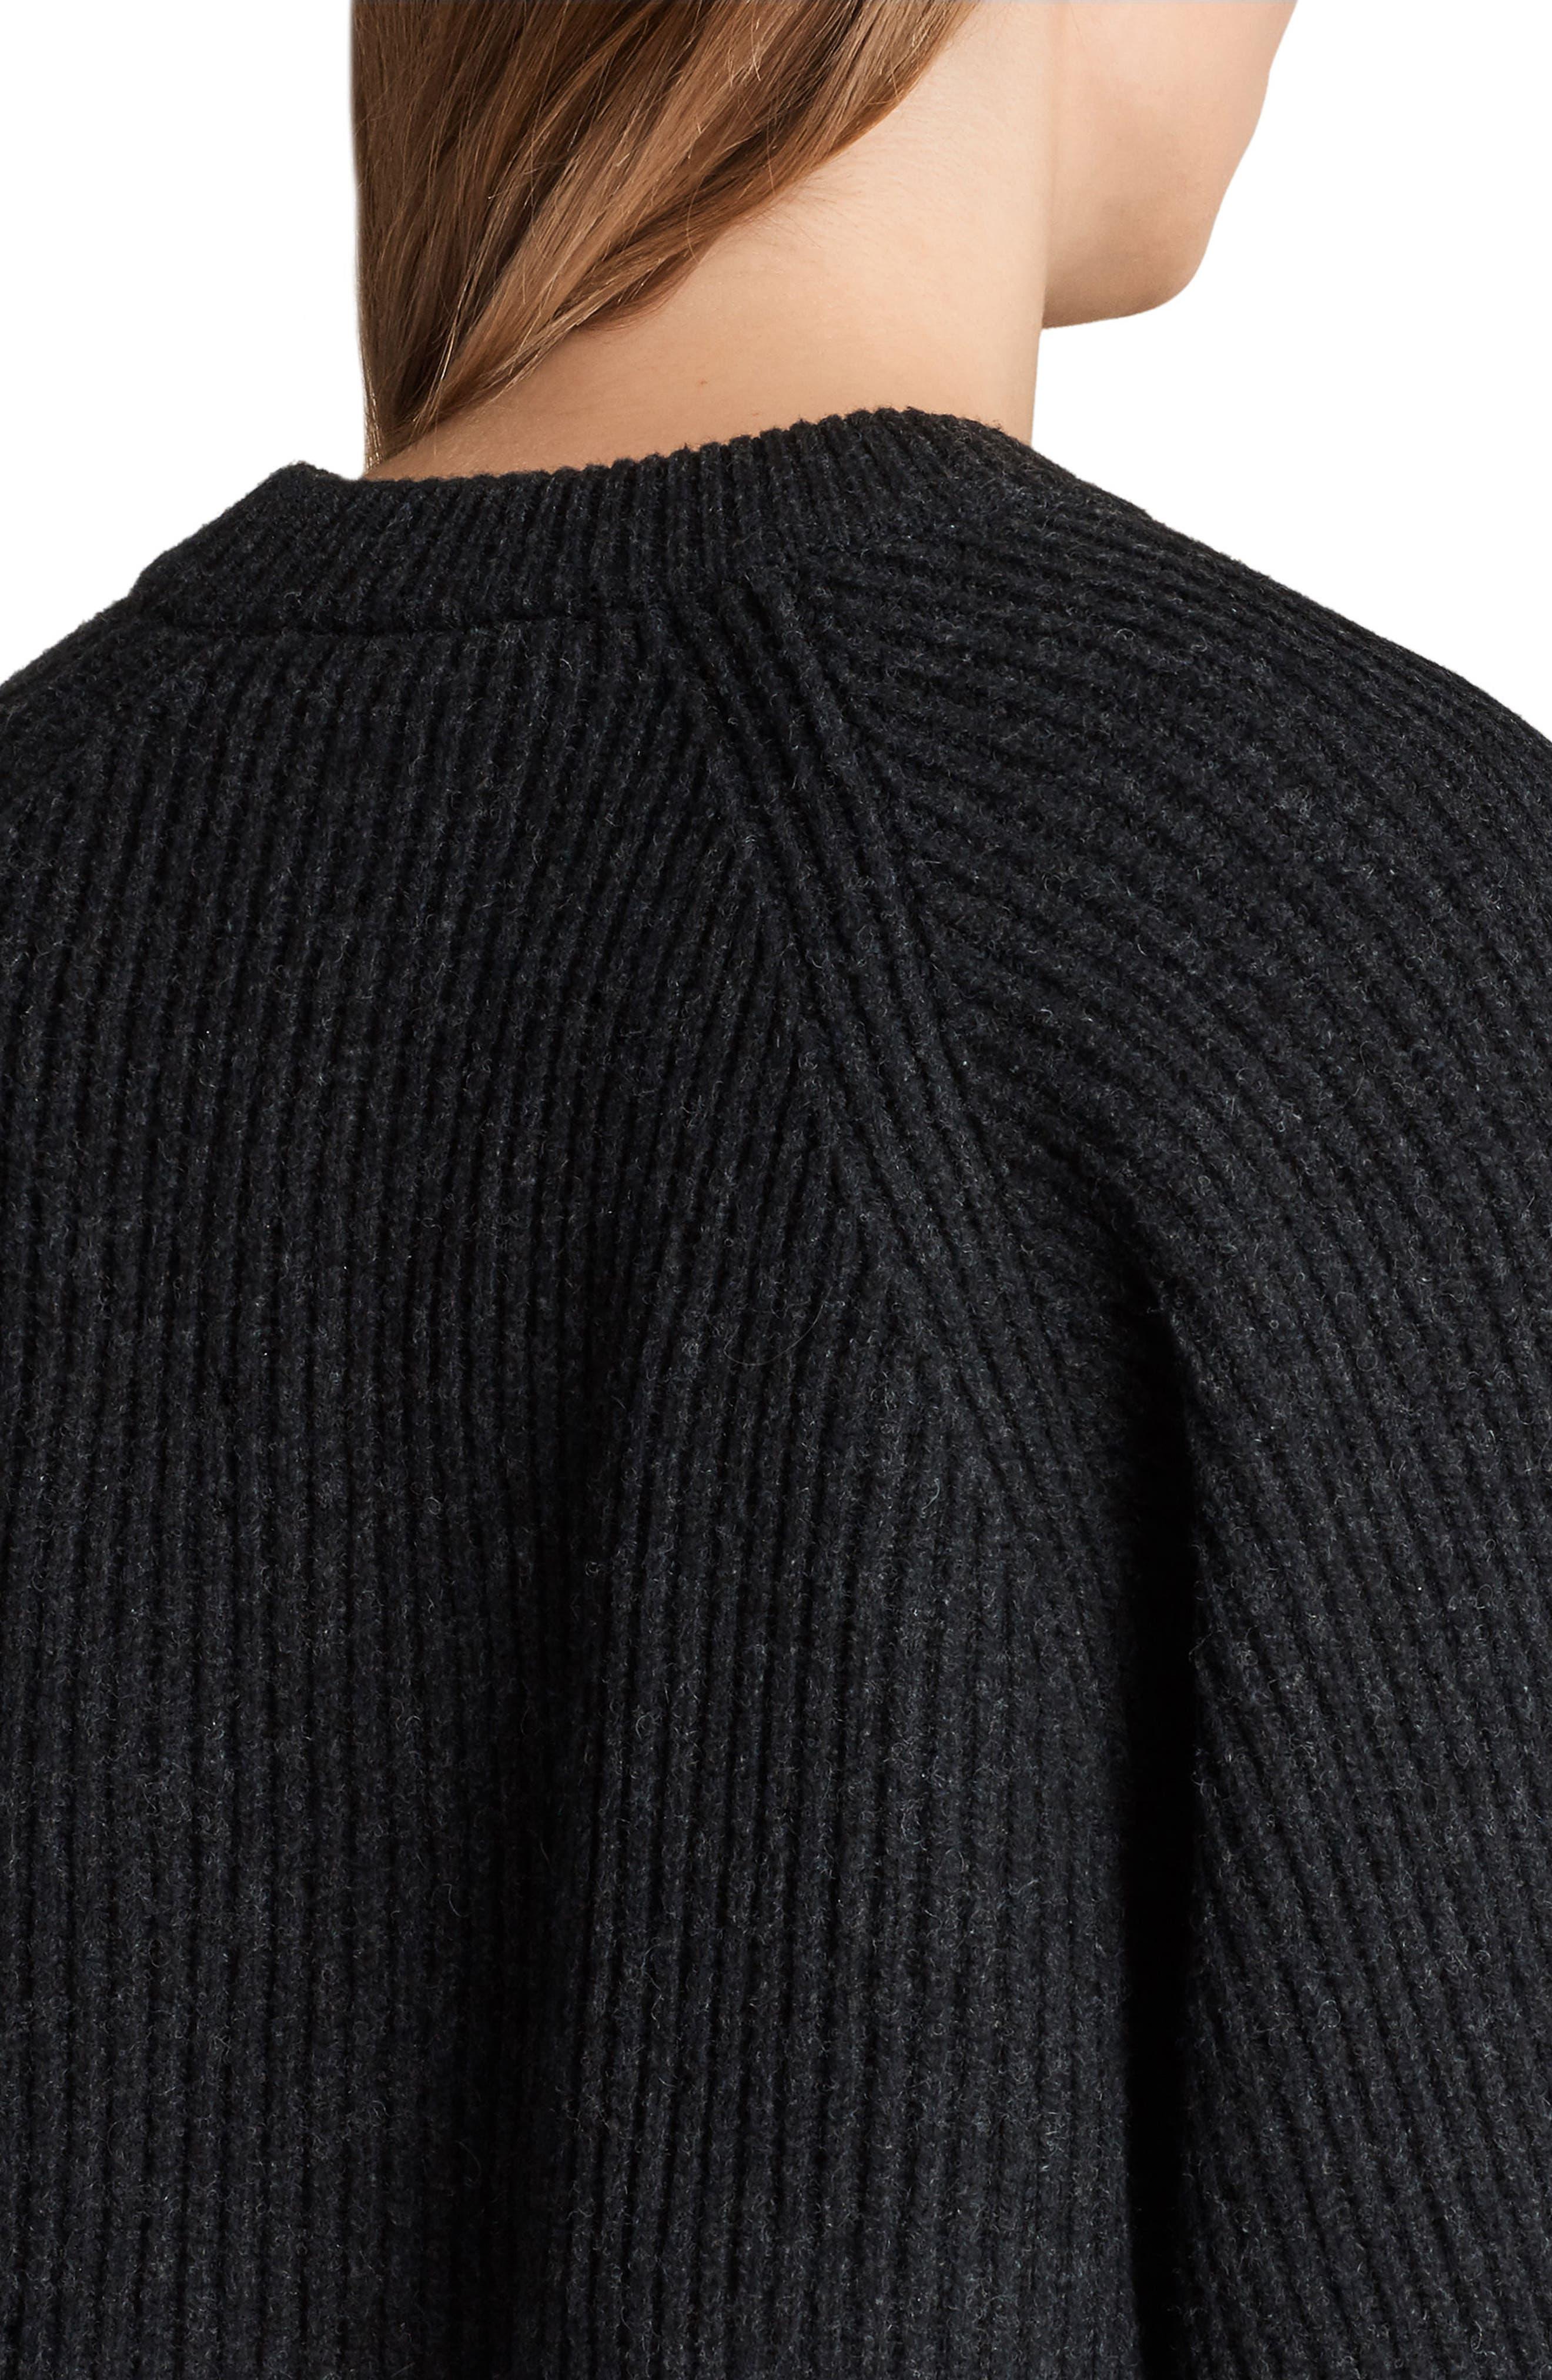 Sura Sweater Dress,                             Alternate thumbnail 4, color,                             Cinder Black Marl